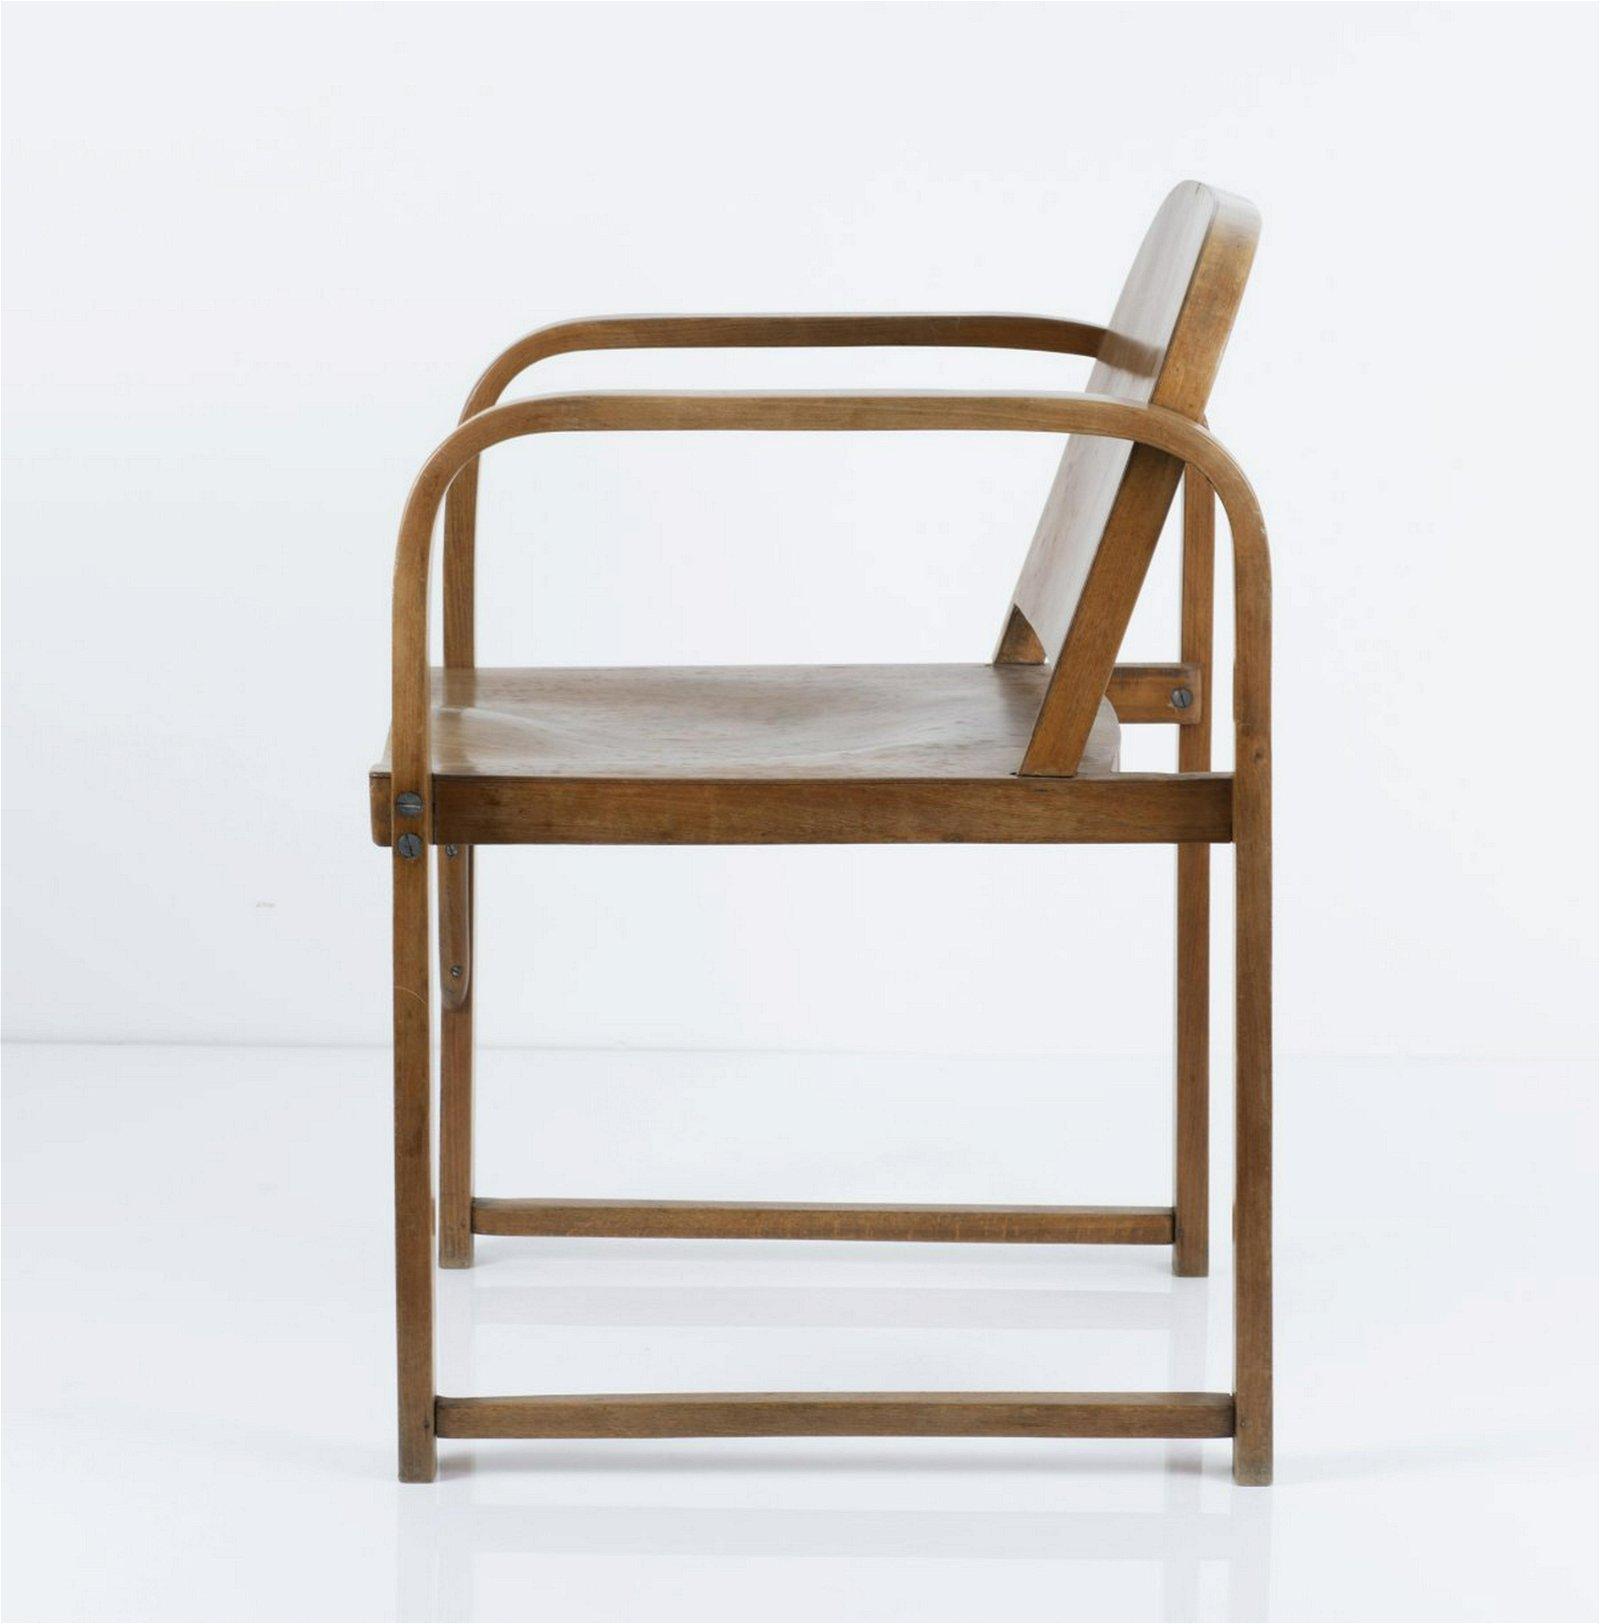 Thonet Mundus, 'A 745 F' armchair, 1920s